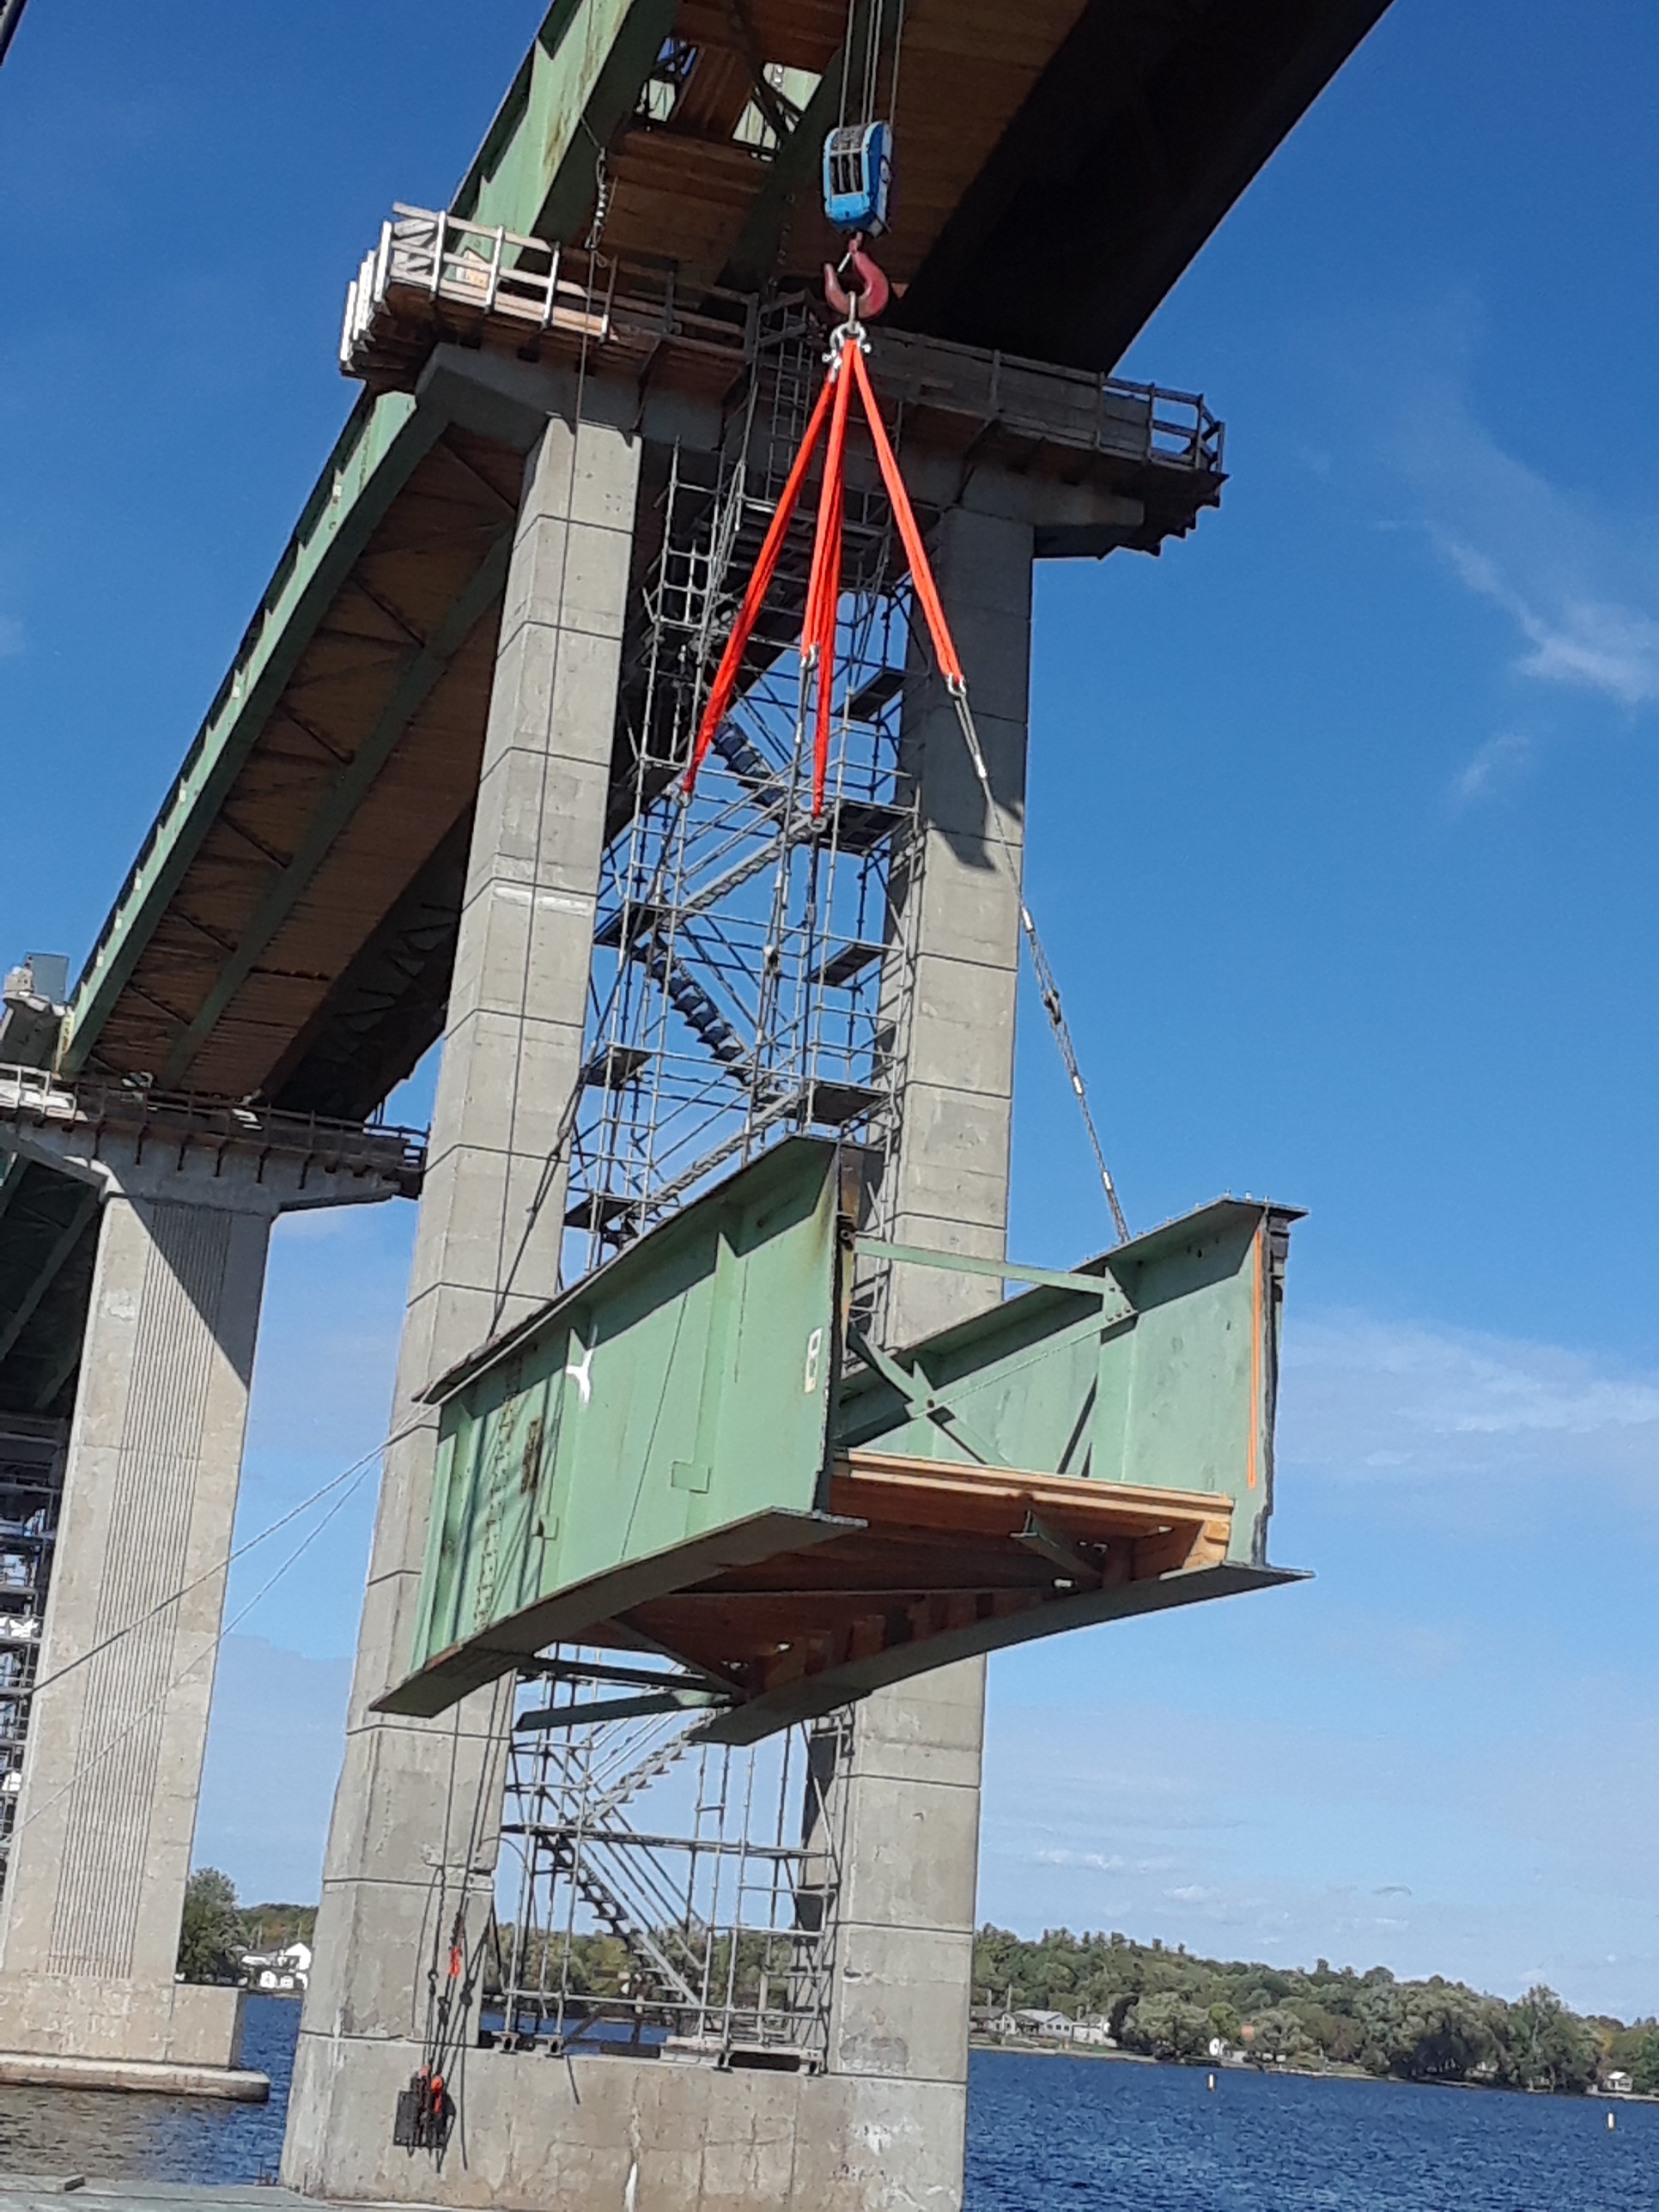 Second piece of girder being lowered